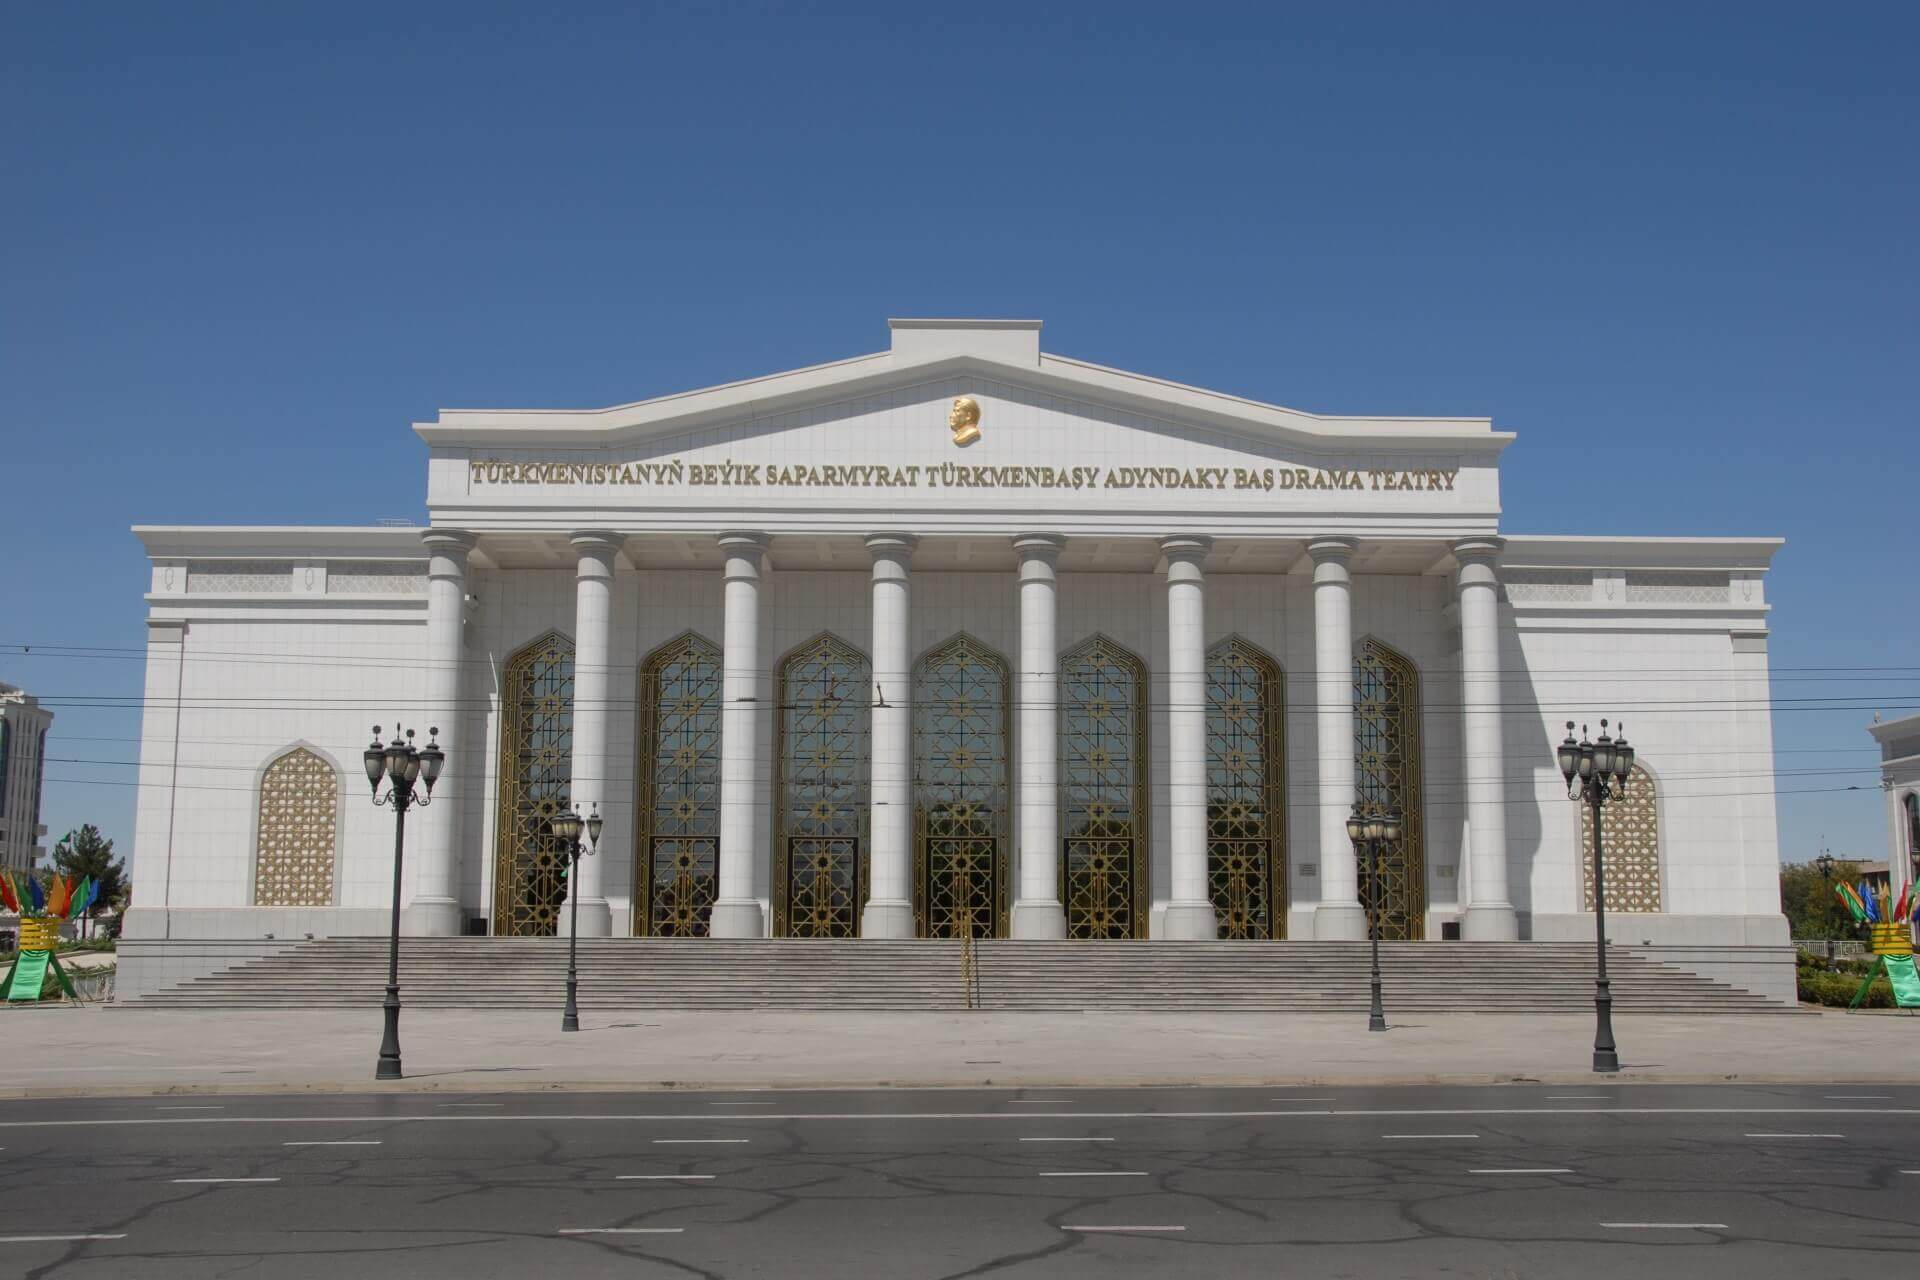 Teatr Narodowy Aszchabad